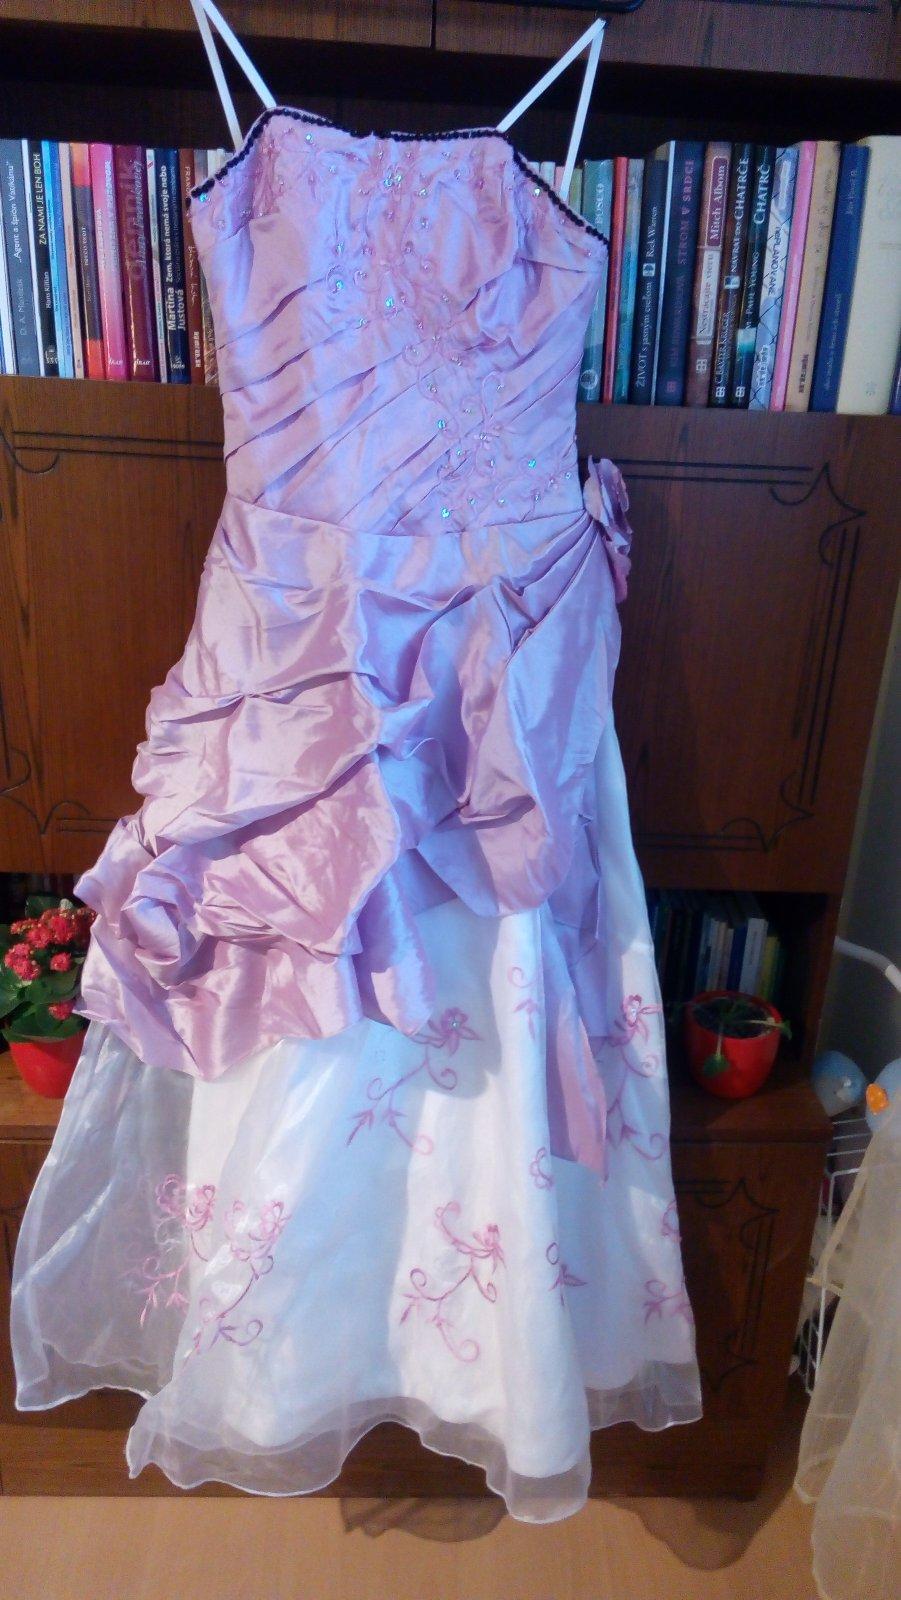 d96ccf7c0b75 Krásne spoločenské šaty